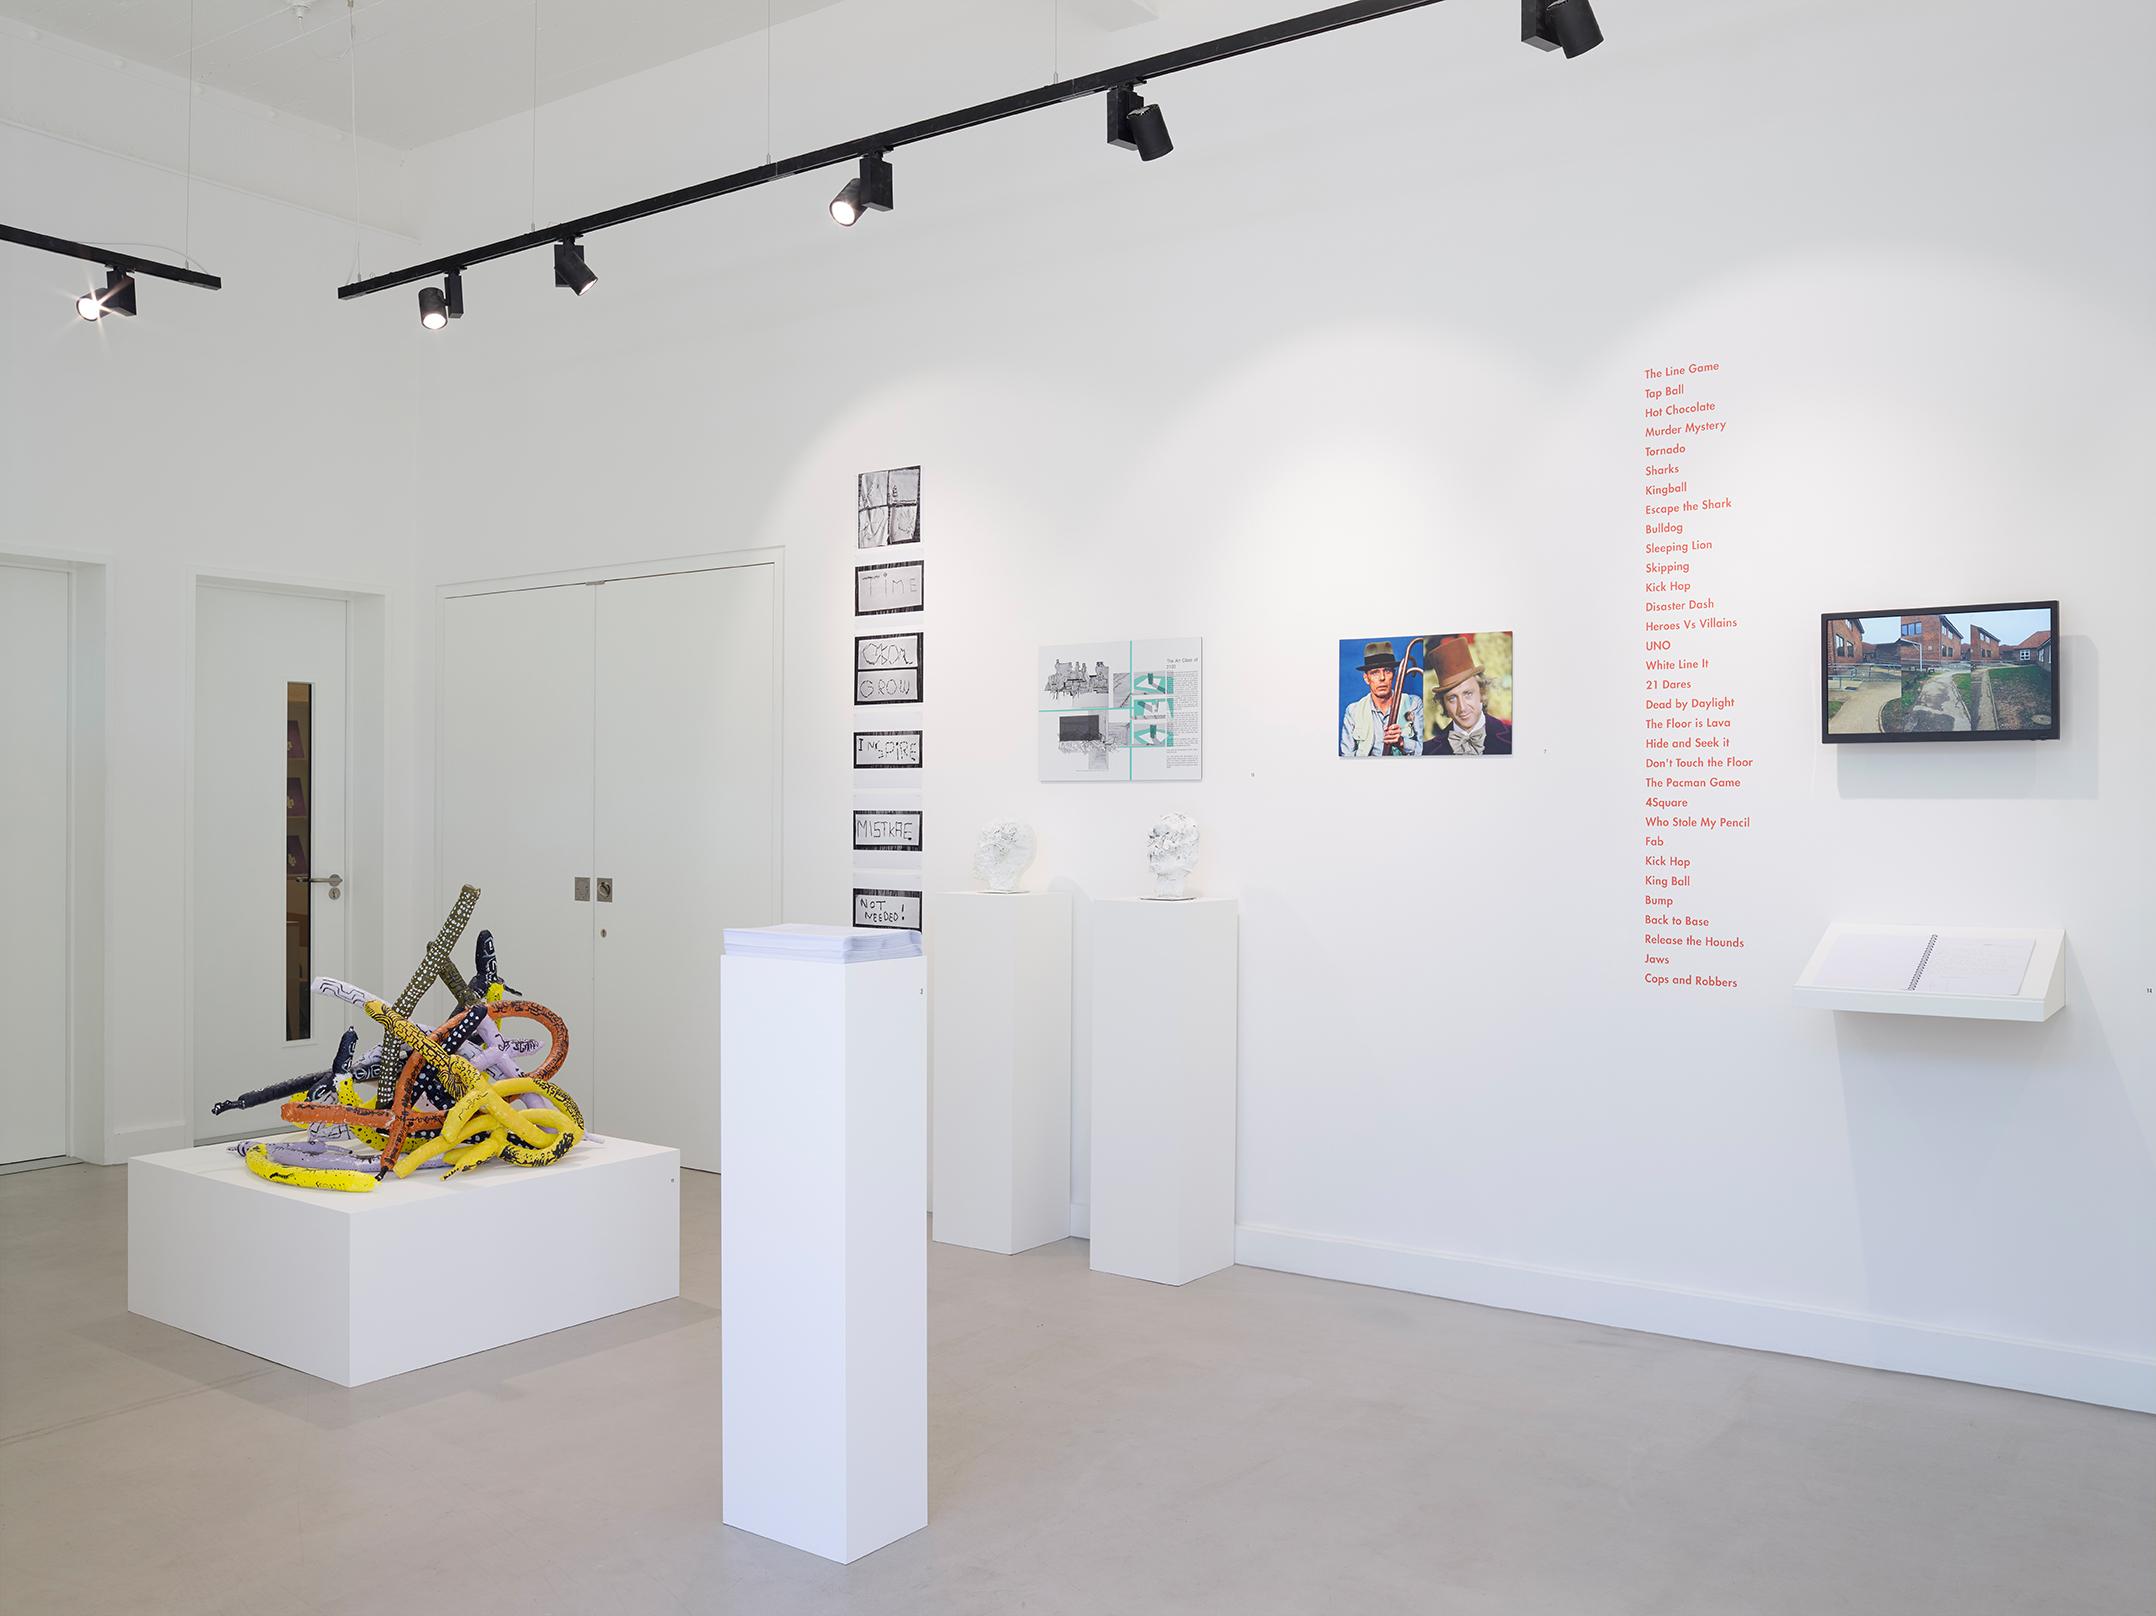 Brink Installation View (Peter Mallet, Courtesy of Freelands Foundation)